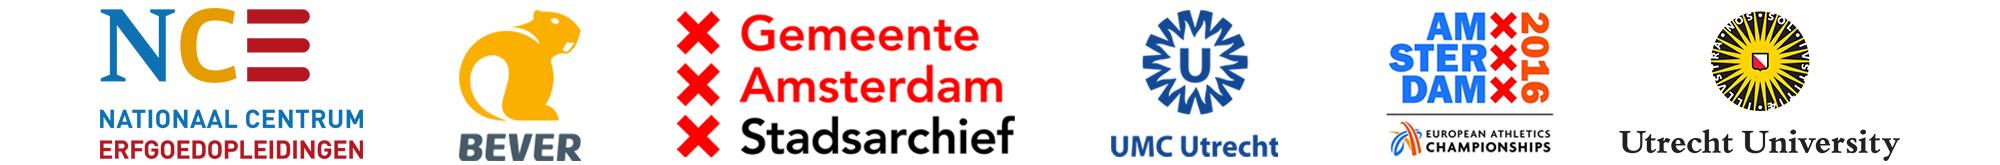 Logo's opdrachtgevers_v2